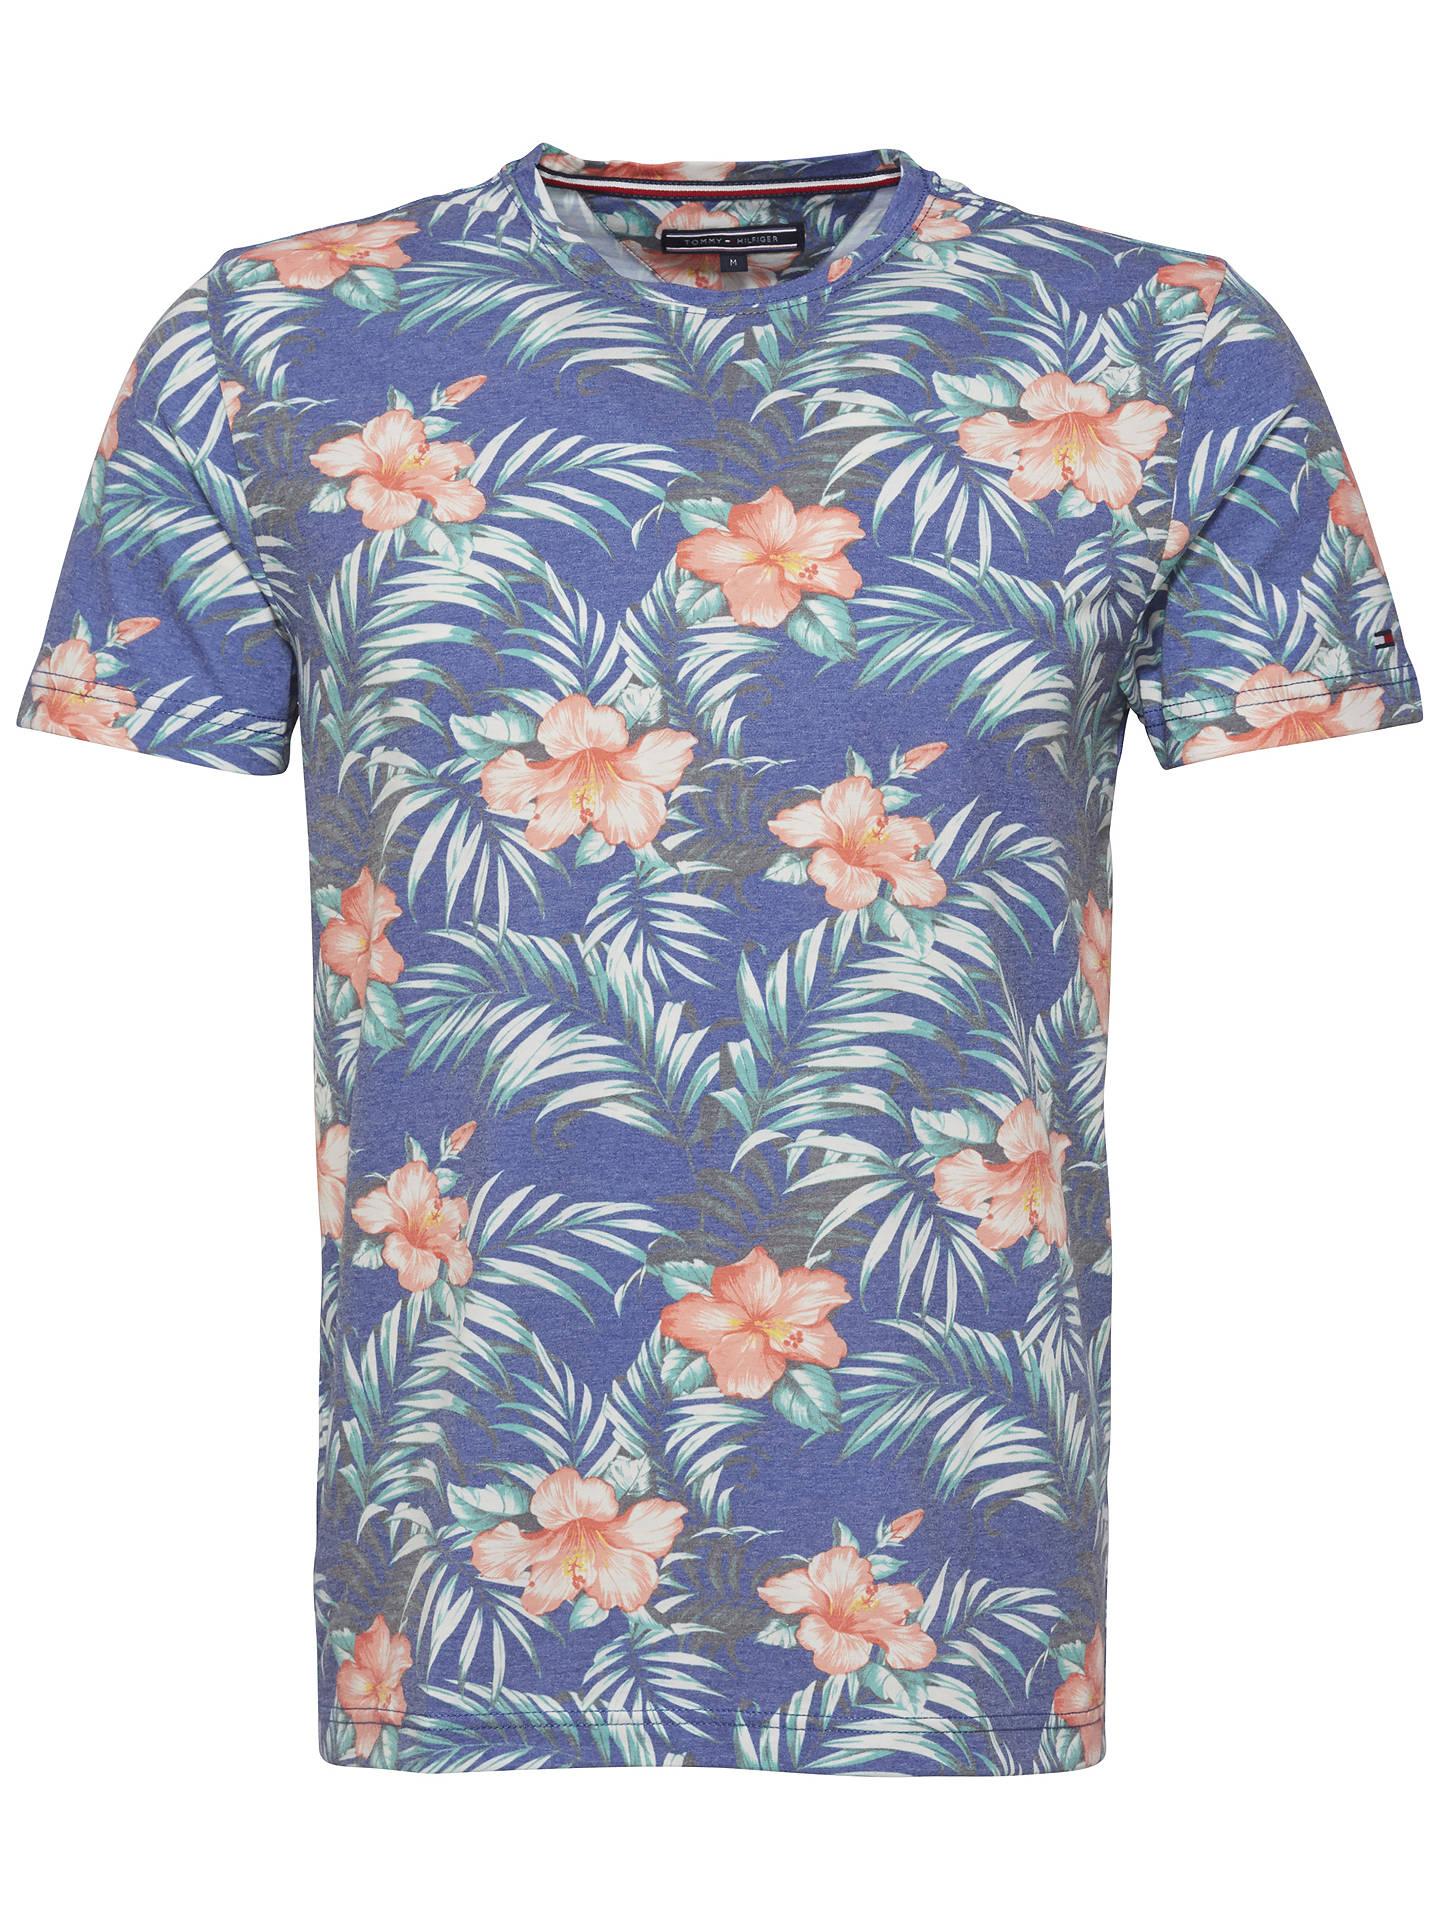 9b6c43e92acc Buy Tommy Hilfiger Hibiscus Printed T-Shirt